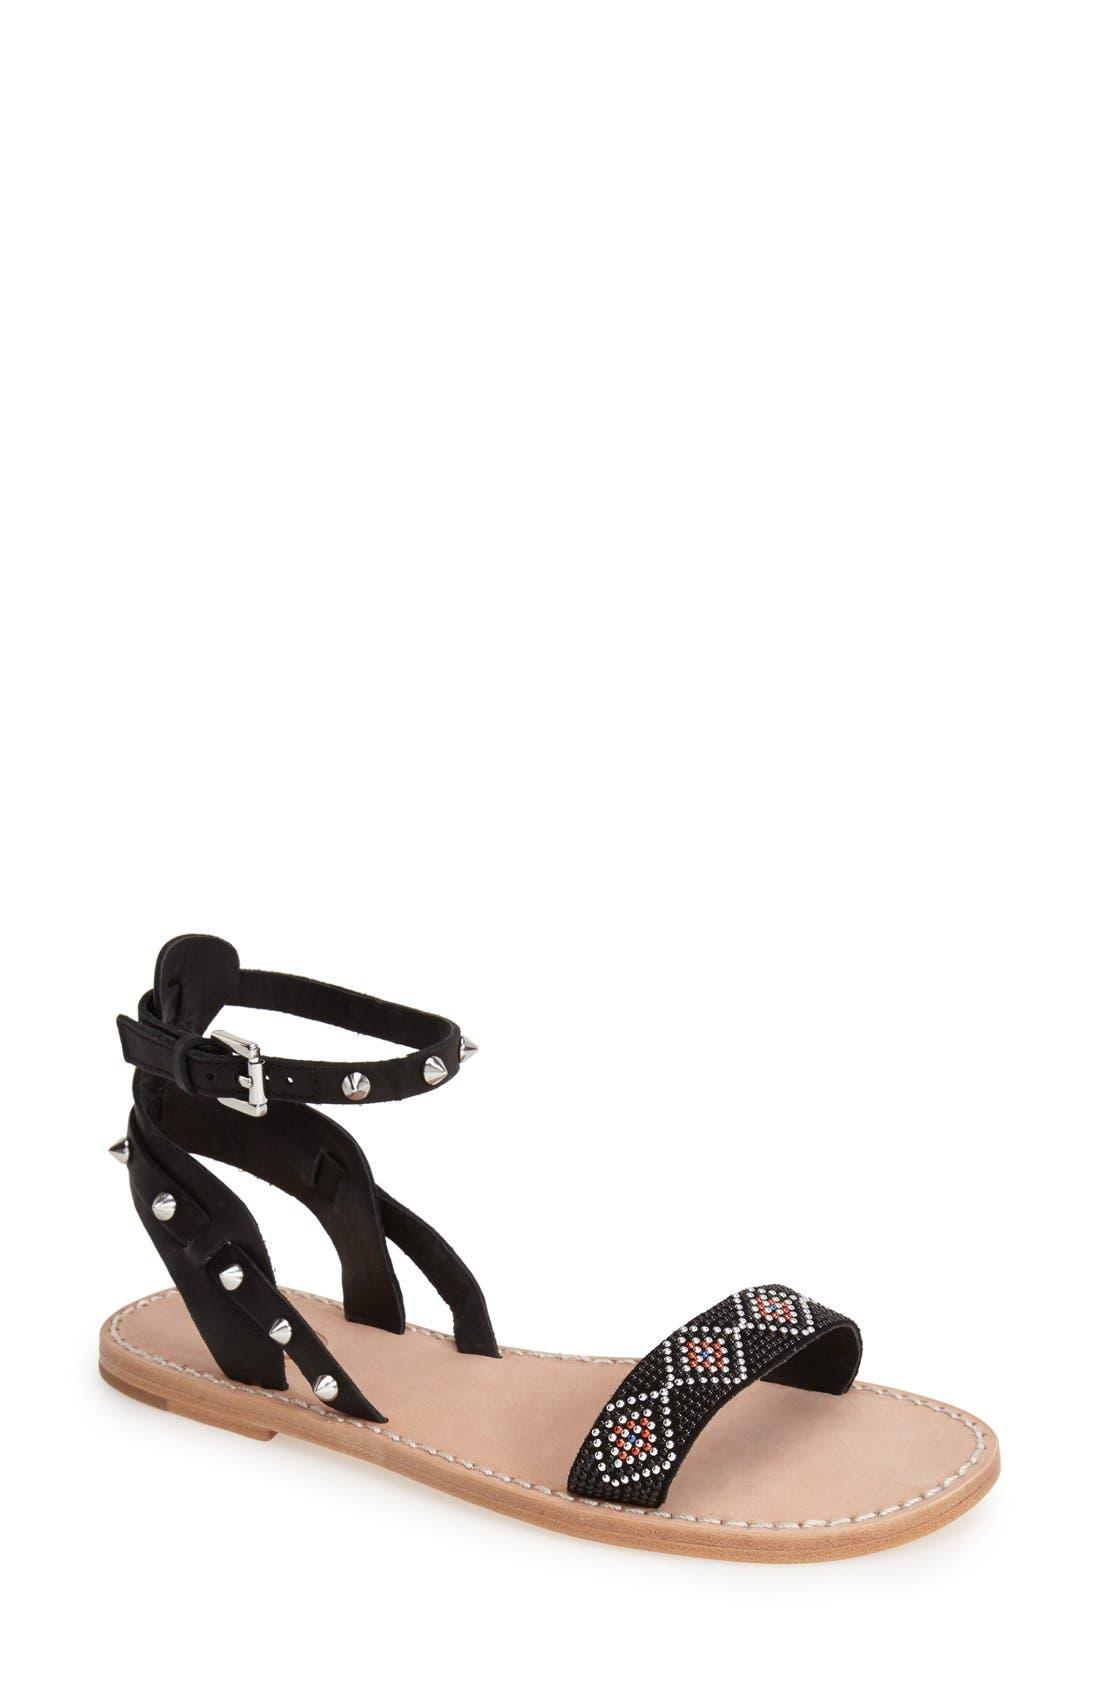 'Pearl' Studded Leather Sandal,                         Main,                         color, Black/ Black